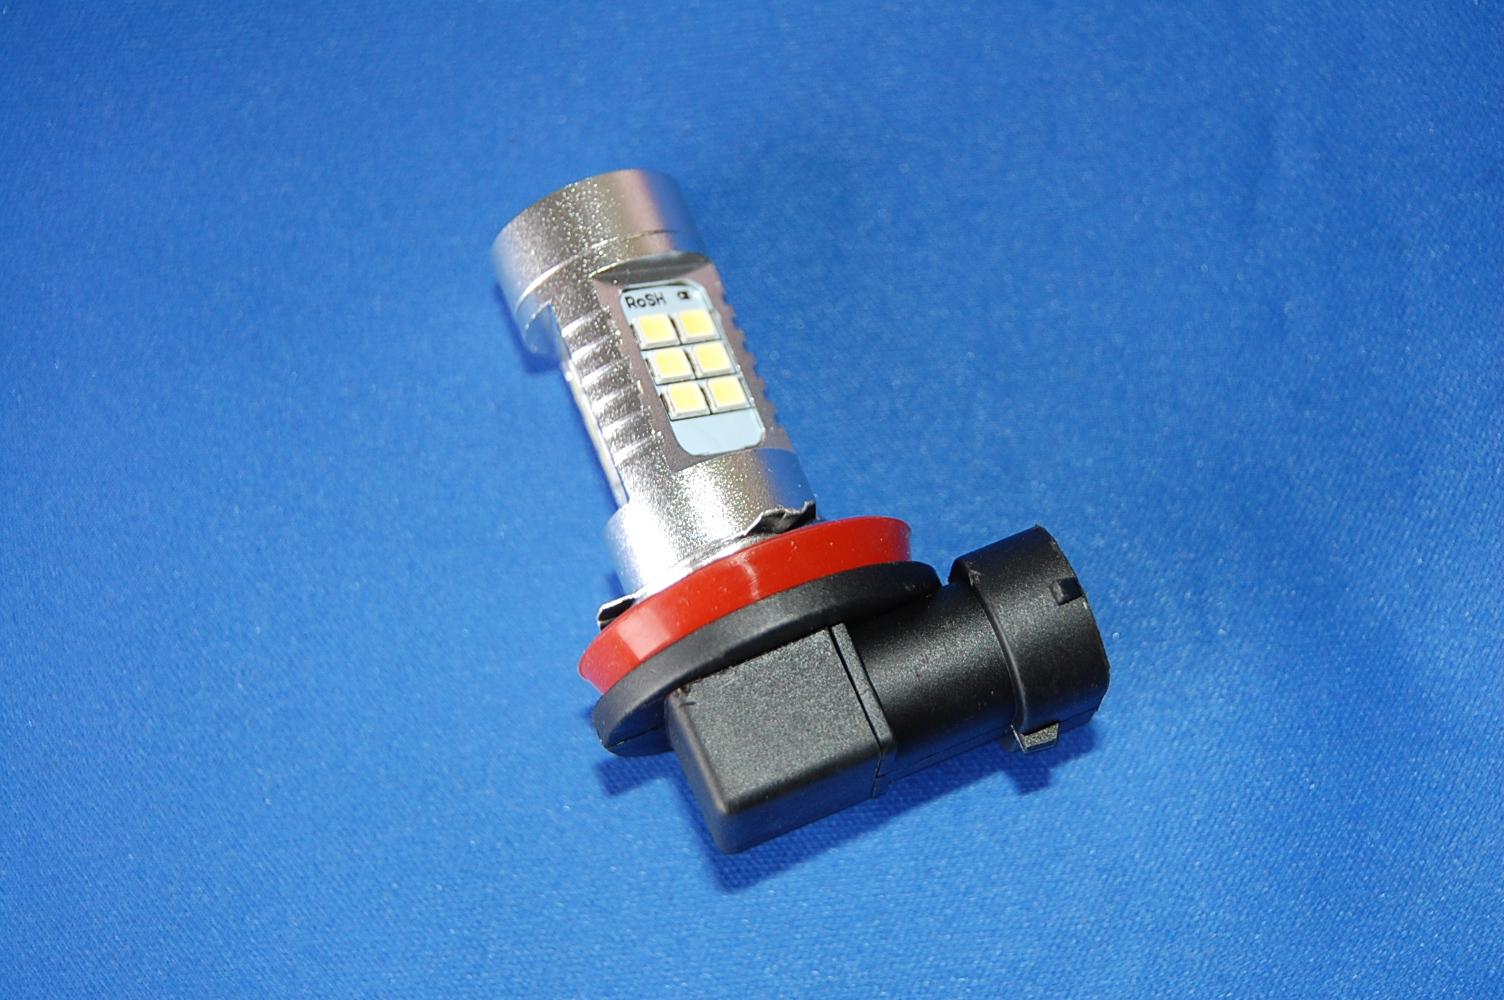 LEDフォグランプ LEDコーナーリングランプ 左右セットH11 50W 通販 激安 LEDチップバルブ1セット2バルブサードレンジローバー後期 RANGEROVERL322 '06-'09 売買